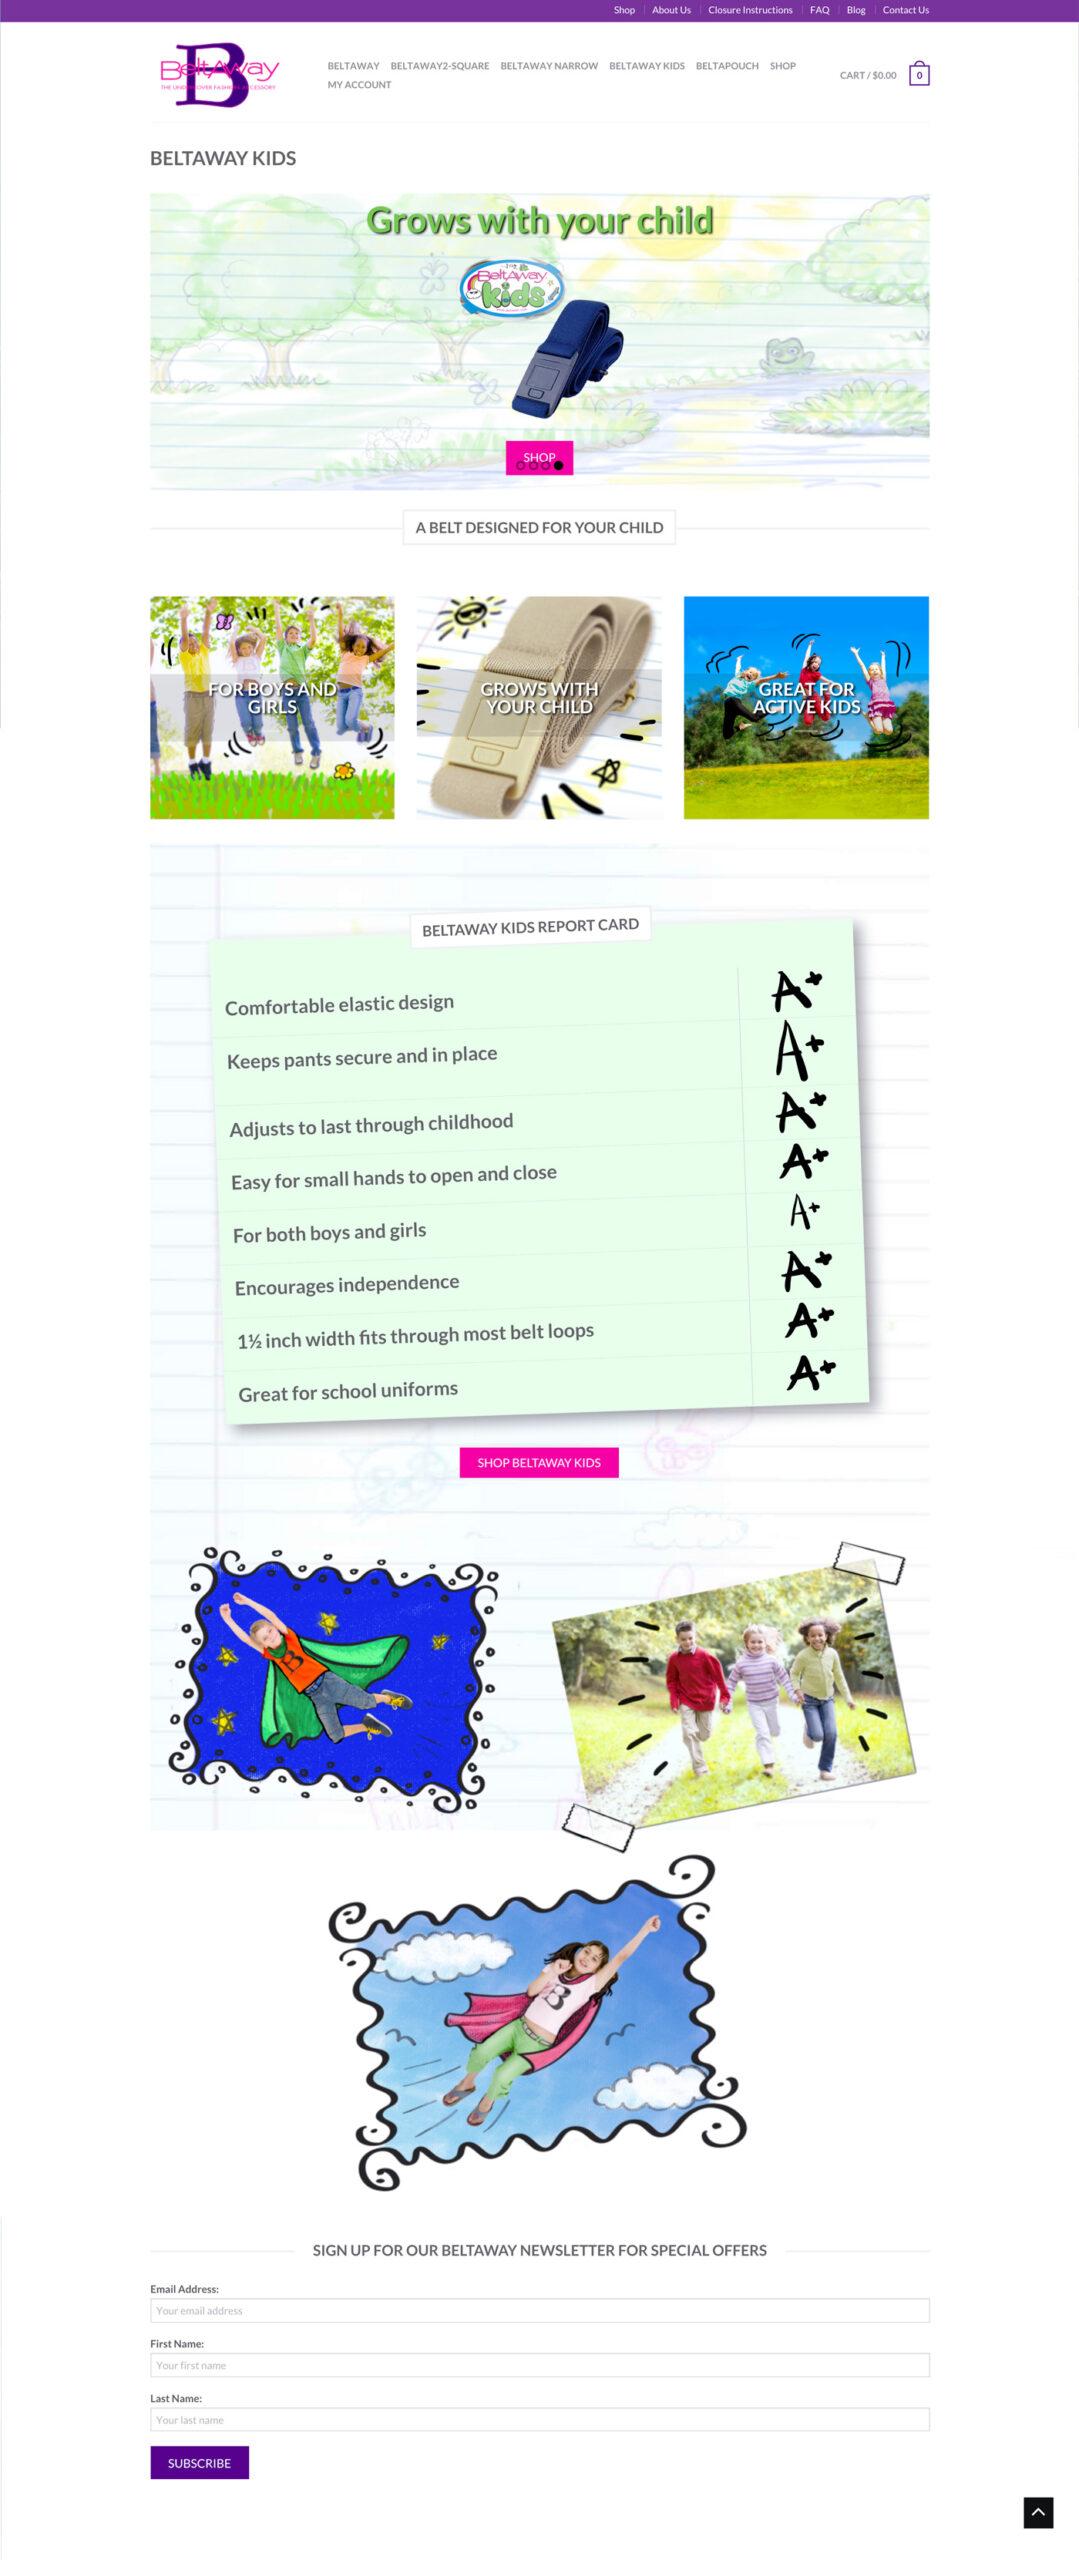 Beltaway kids web site screen shots